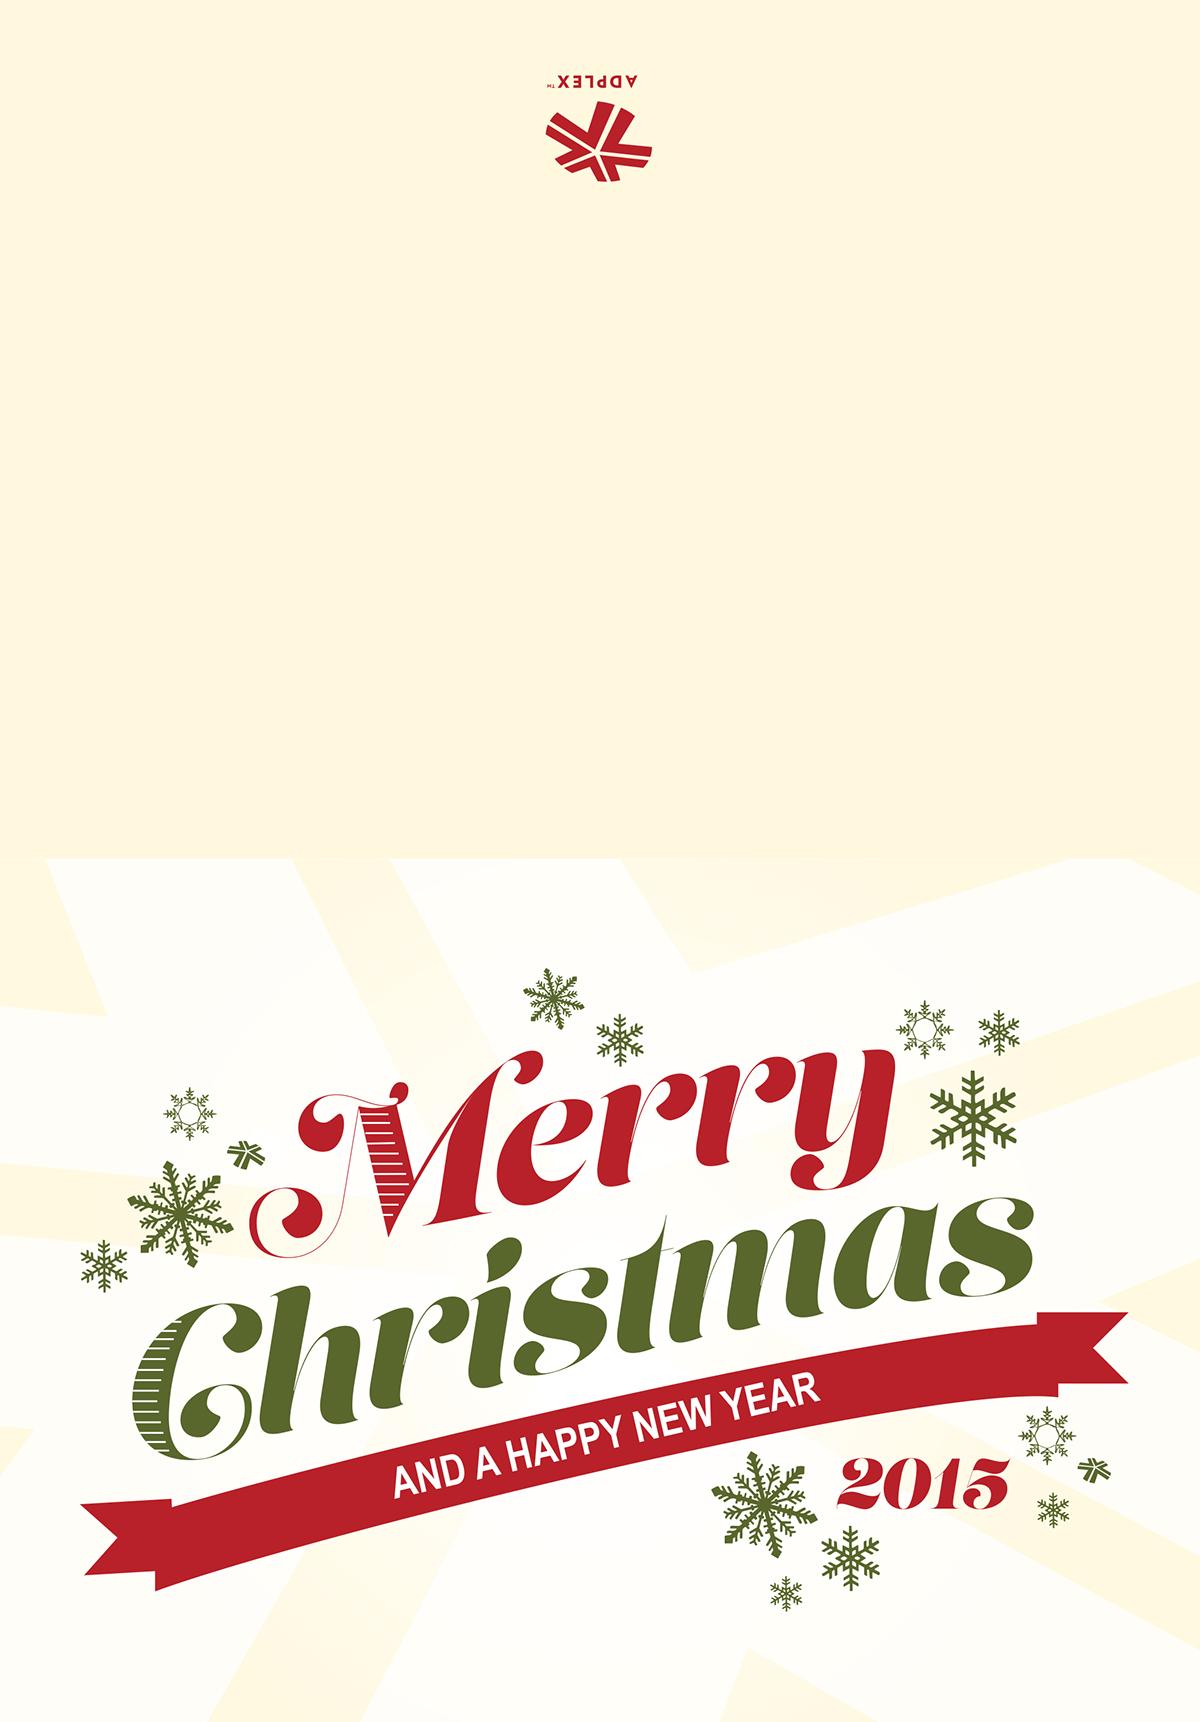 2015 Company Christmas Card Design On Behance